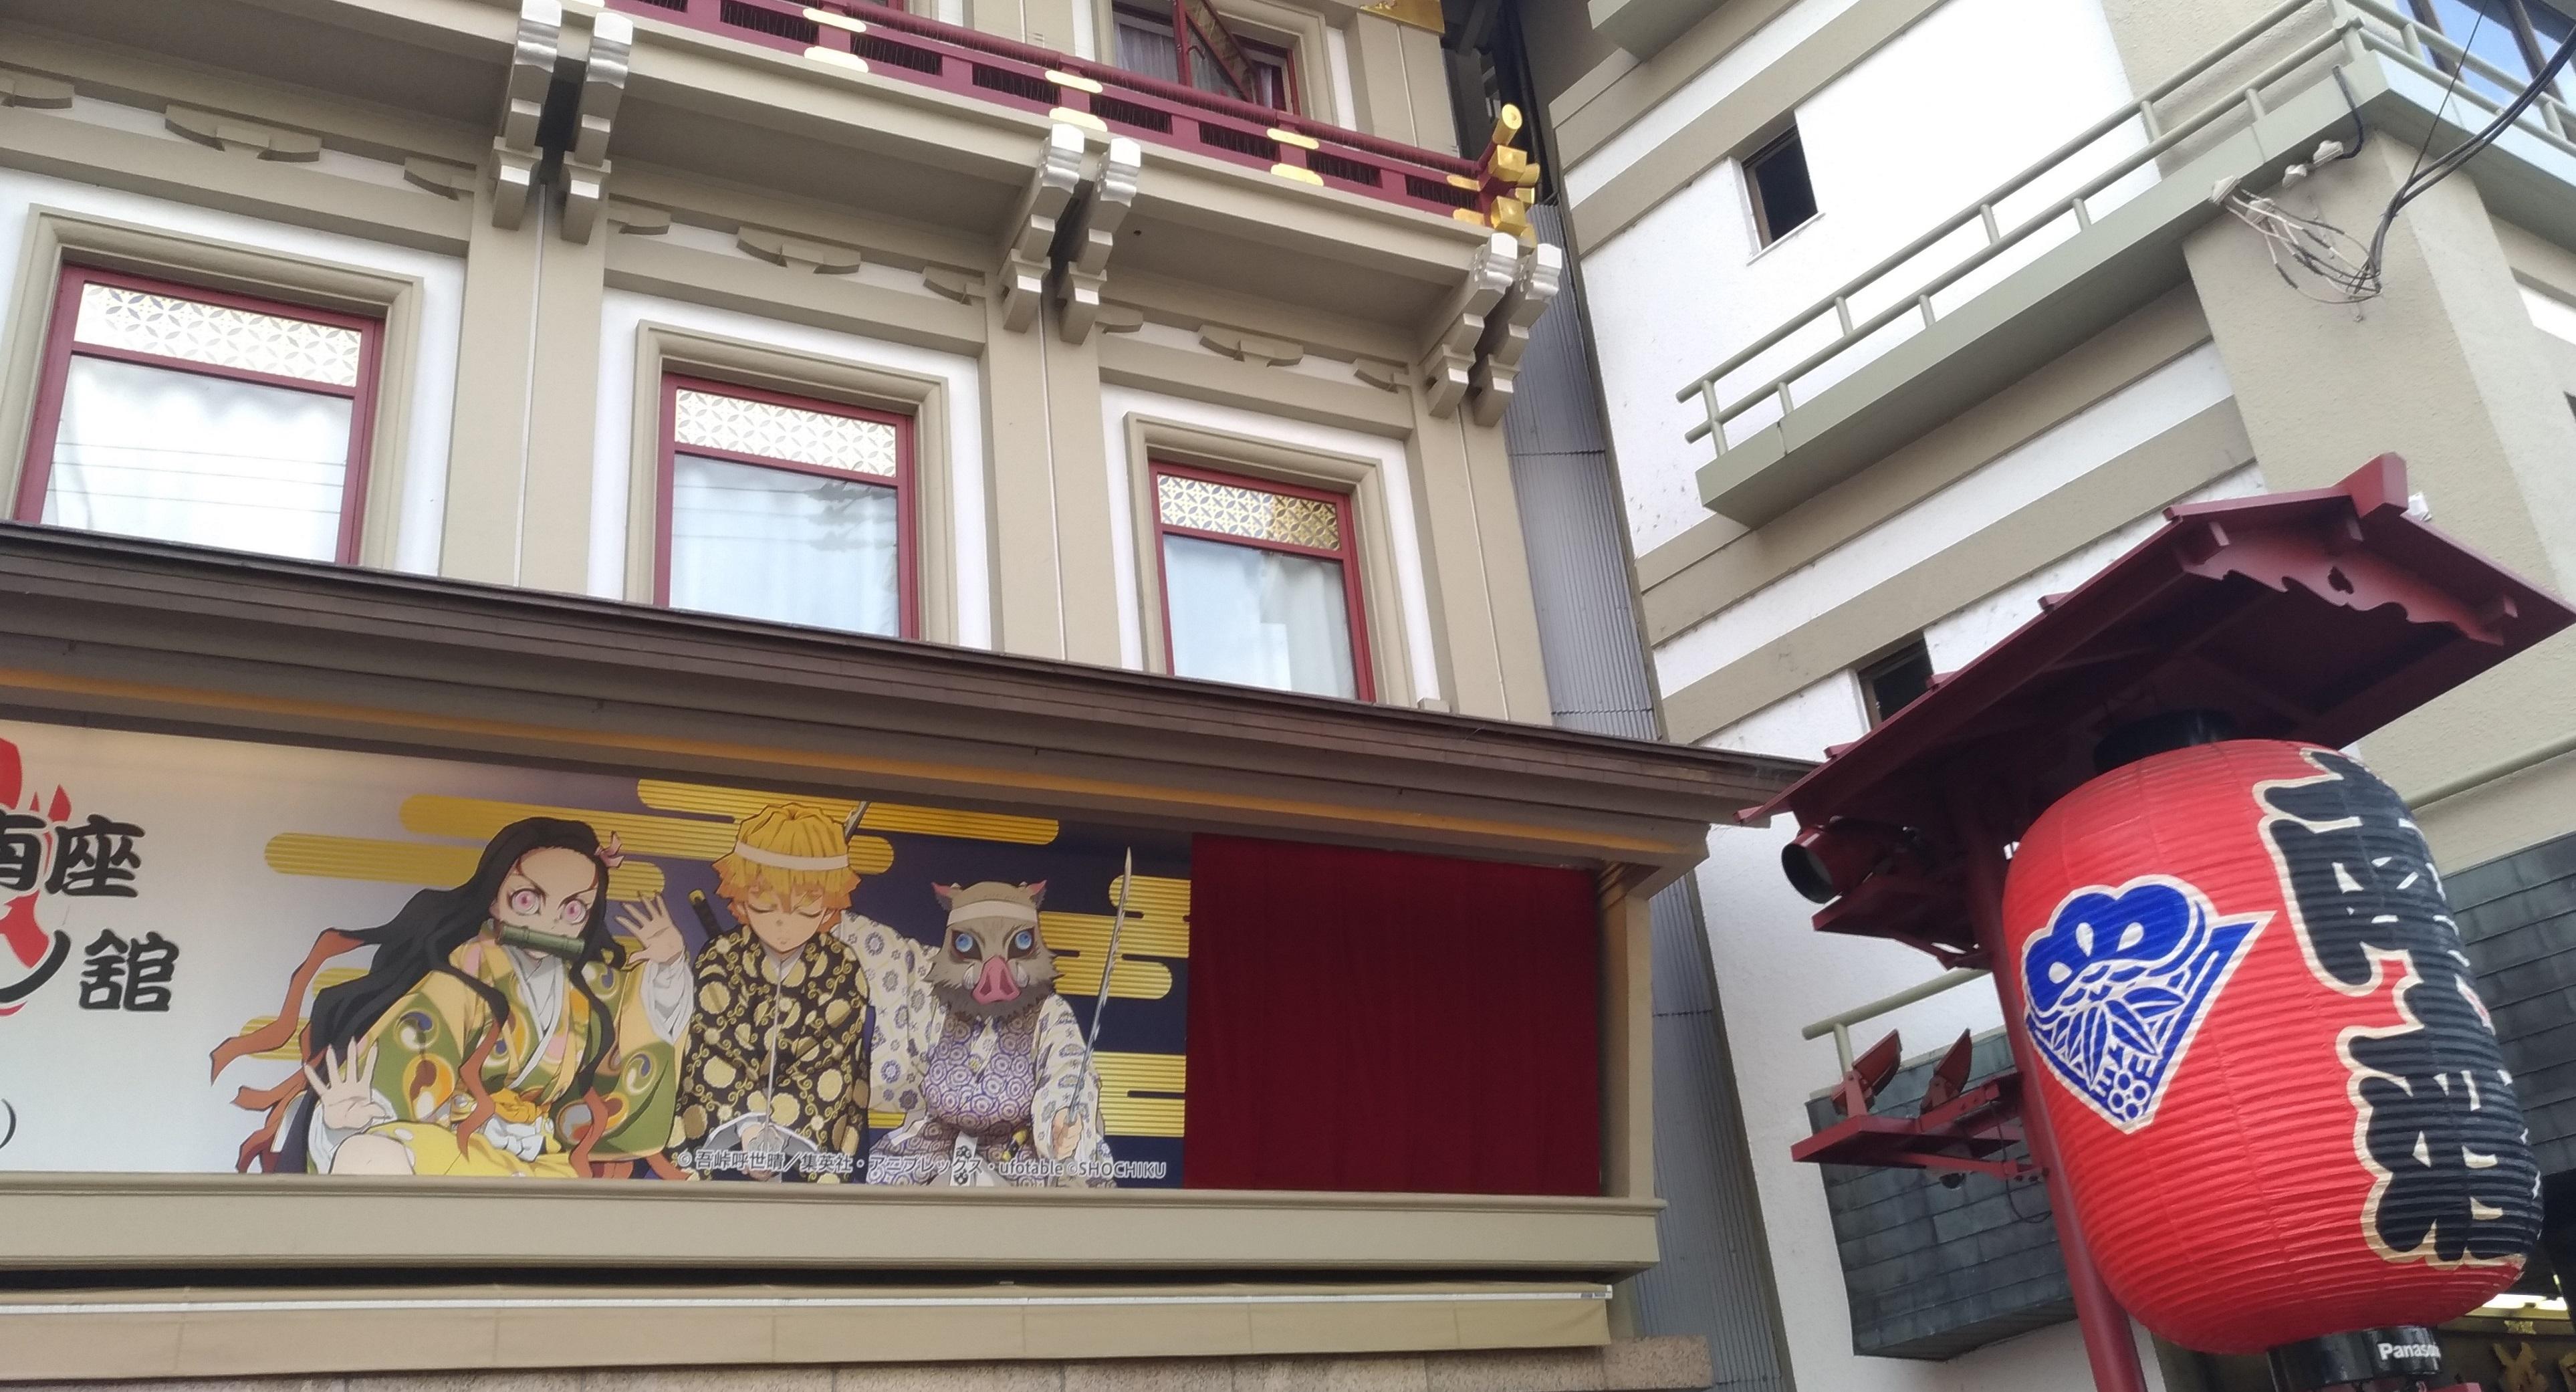 kimetsu_yaiba_1108_kyoto_minami_reviews_blogs_1.jpg